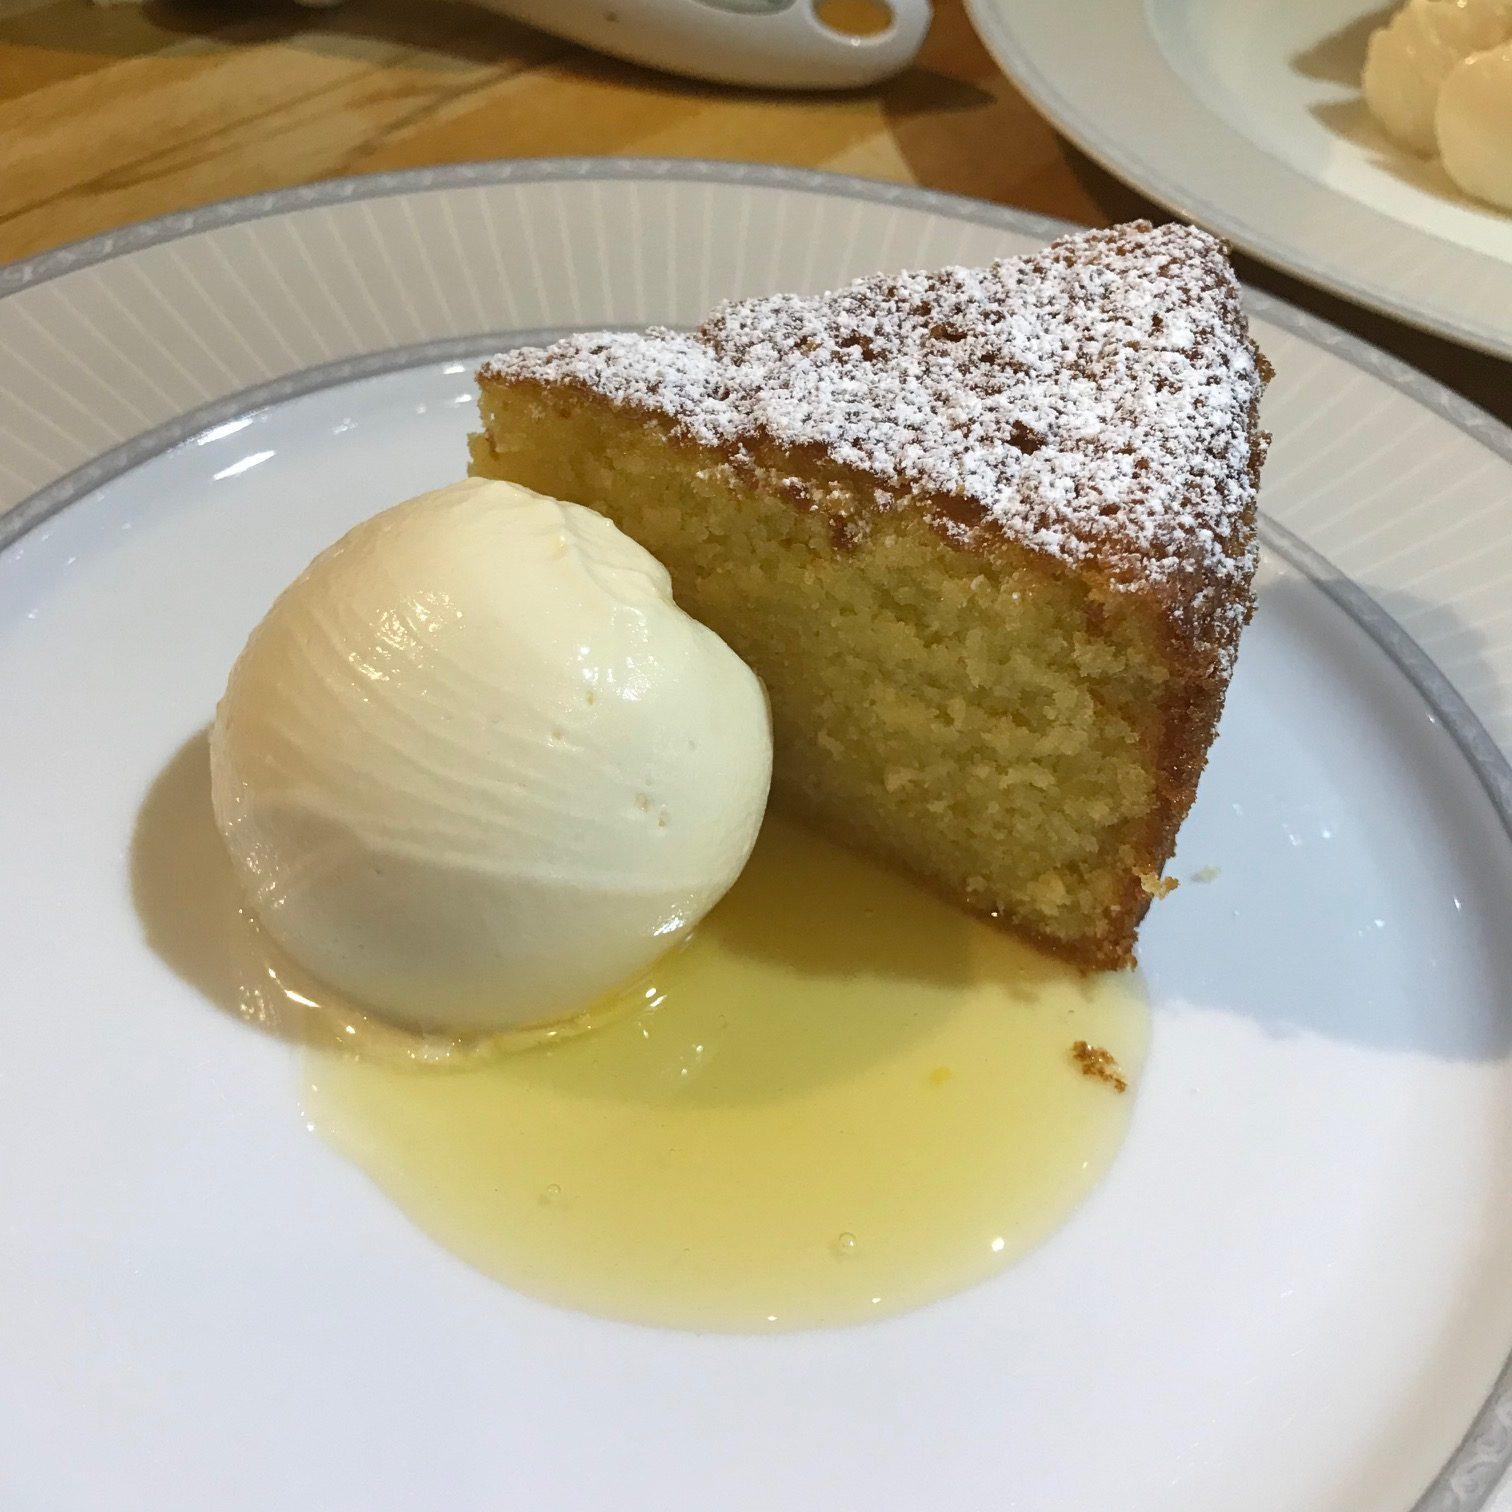 20190815 - Olive Oil Cake with Lemon Sauce and Lemon Curd Ice-cream